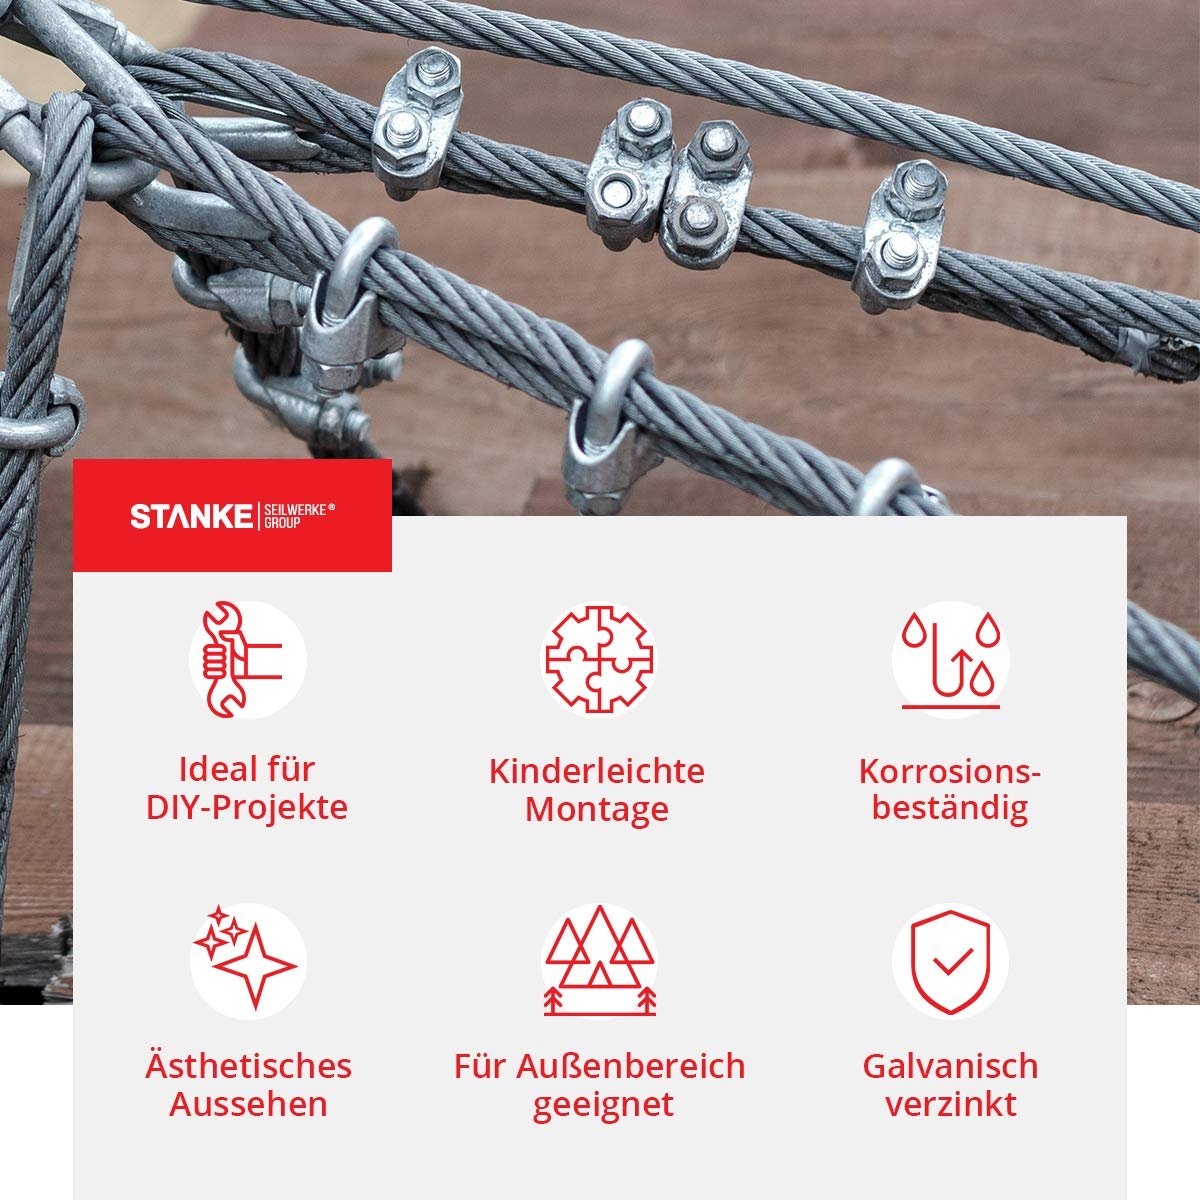 Seilwerk STANKE 100x Duplex Klemme Gr/ö/ße 2 f/ür 2 mm Drahtseile Seilklemme Verzinkt Stahlseil